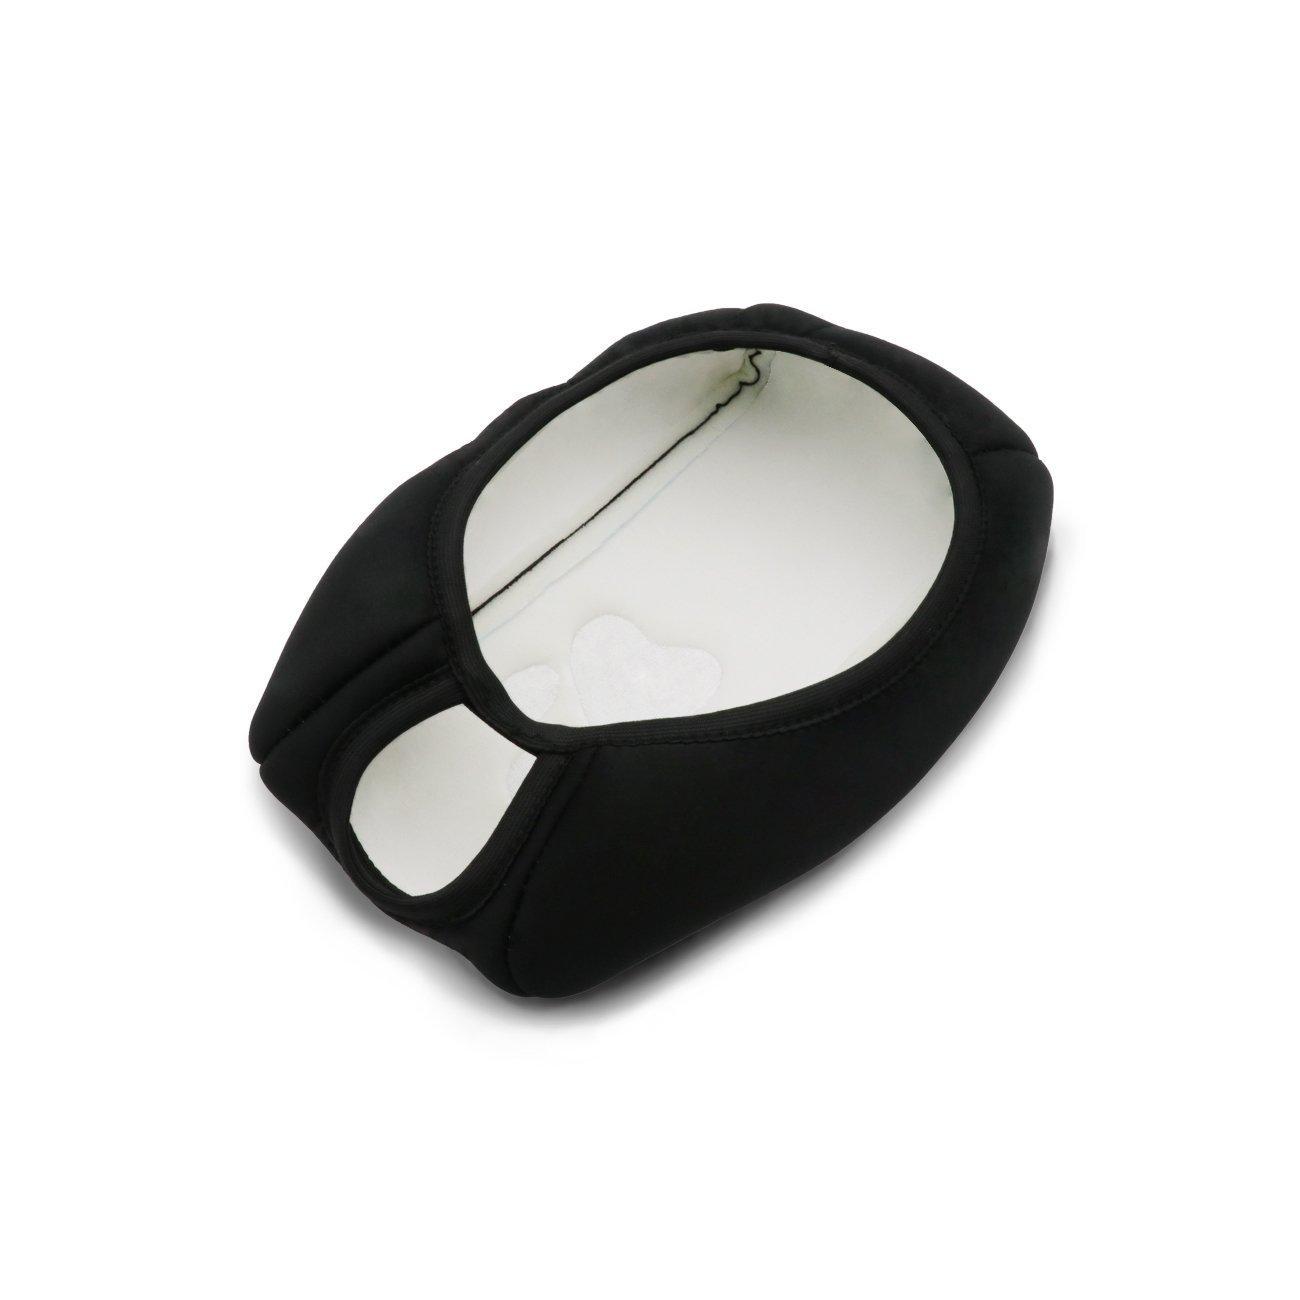 neopreno color negro DQDZ Funda para reposabrazos de consola central